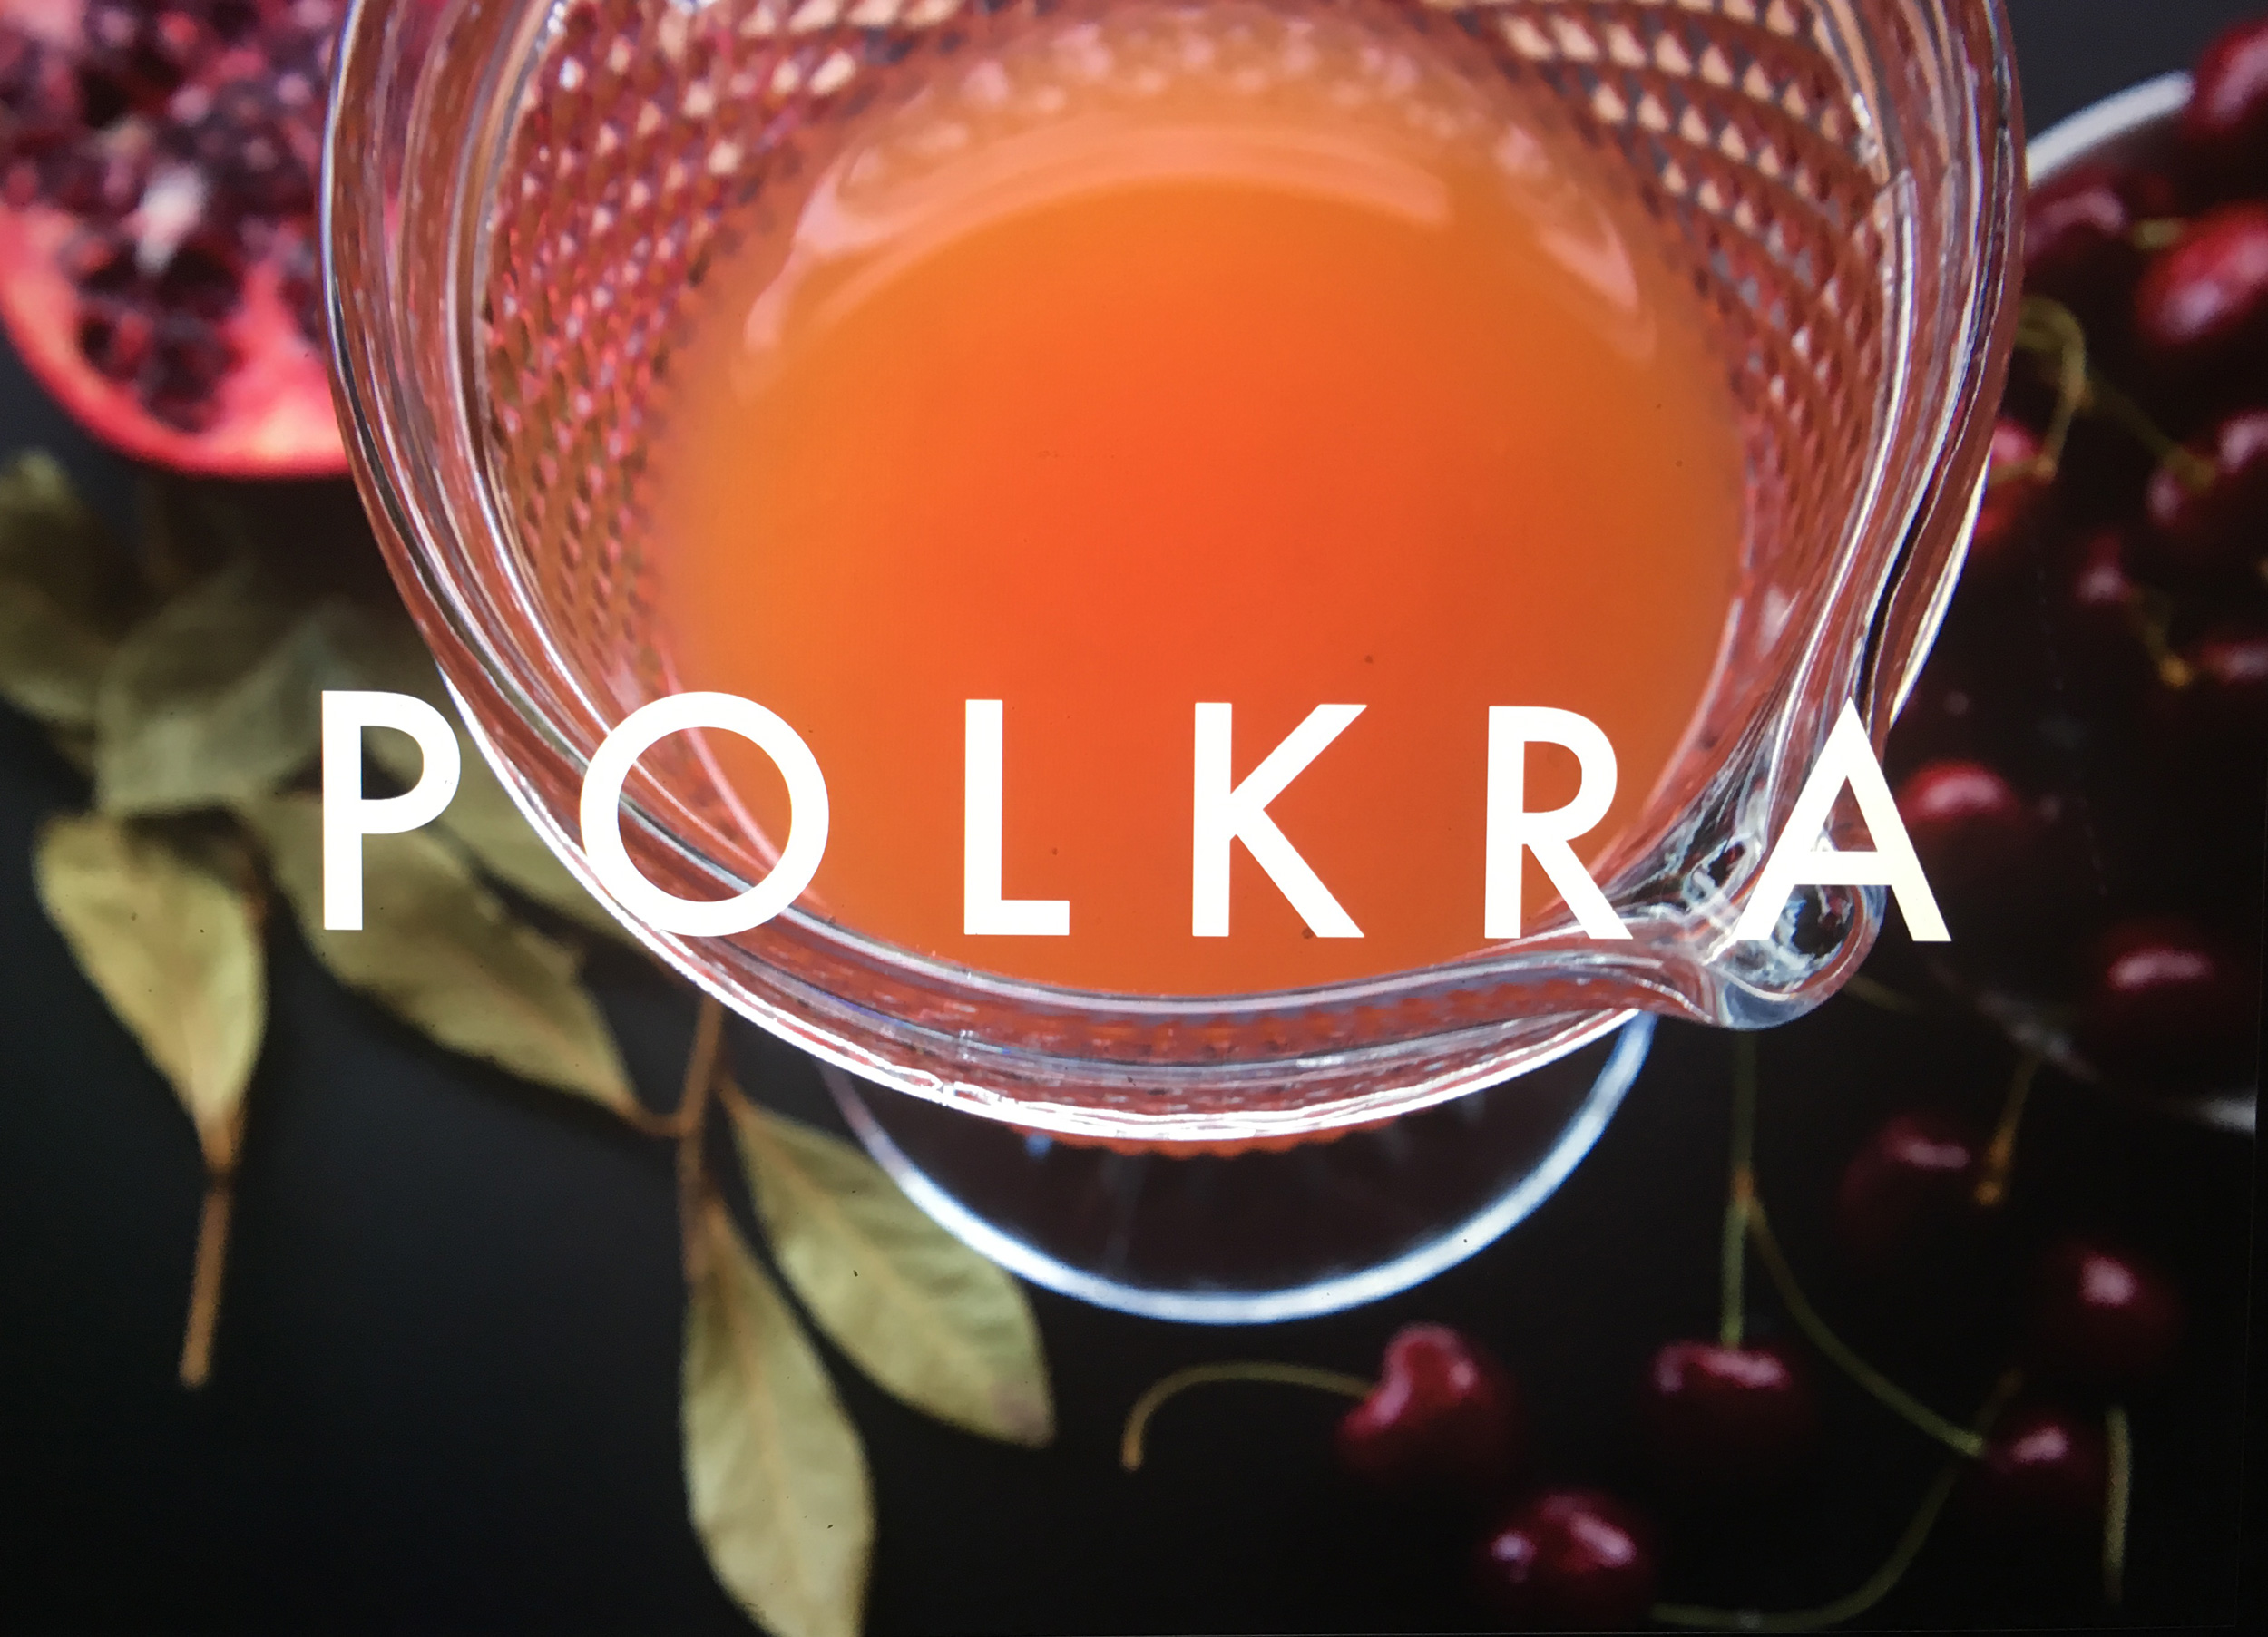 Polkra_01.jpg